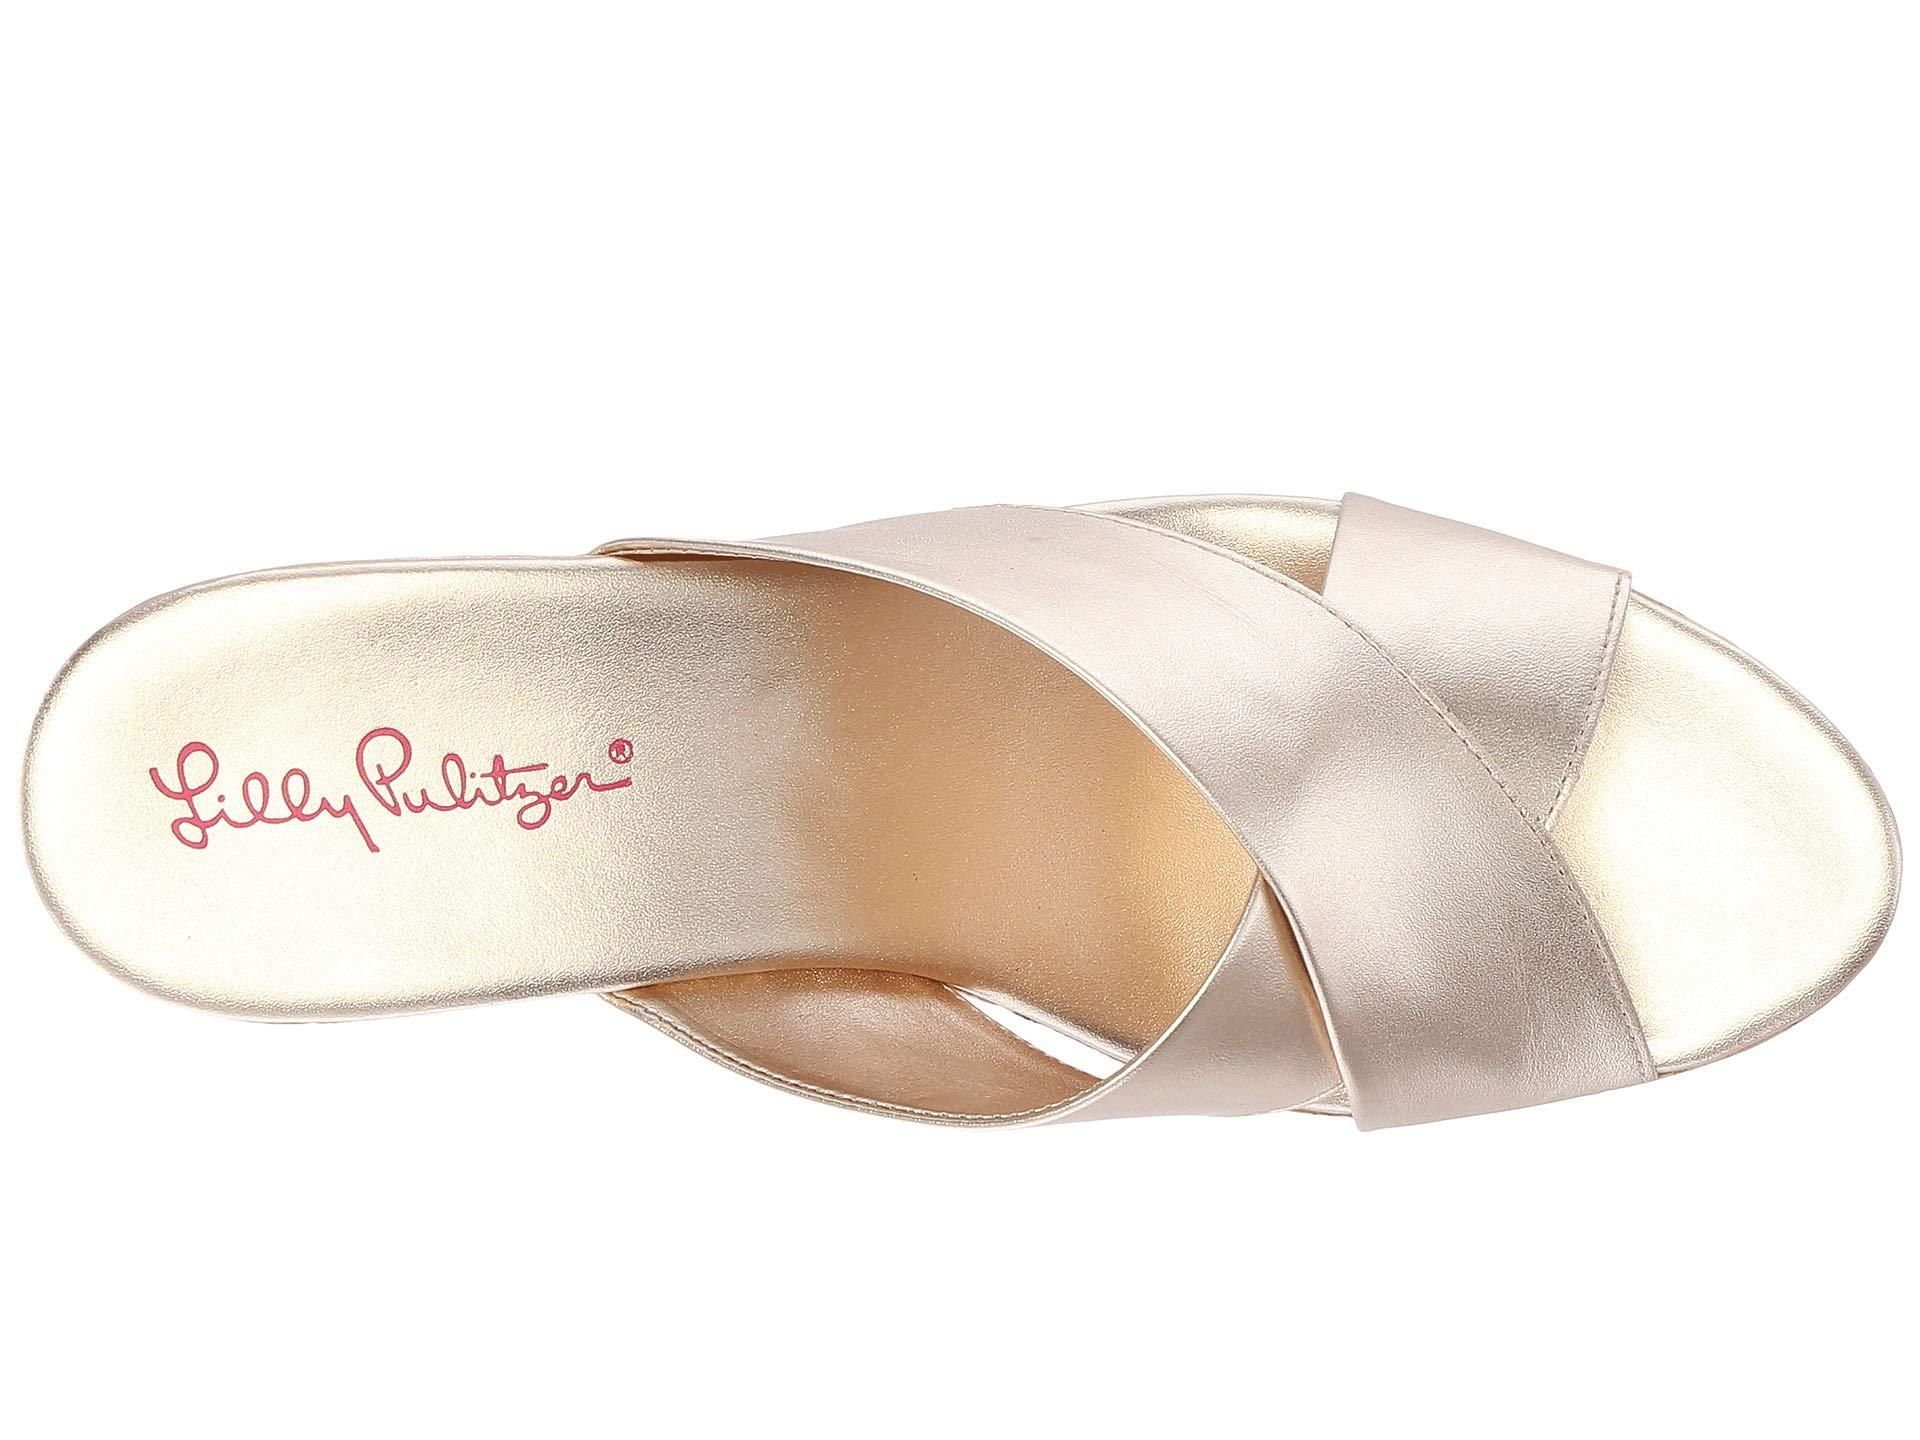 78c315fef8bc Lyst - Lilly Pulitzer Selena Slide (gold Metallic) Women s Slide ...